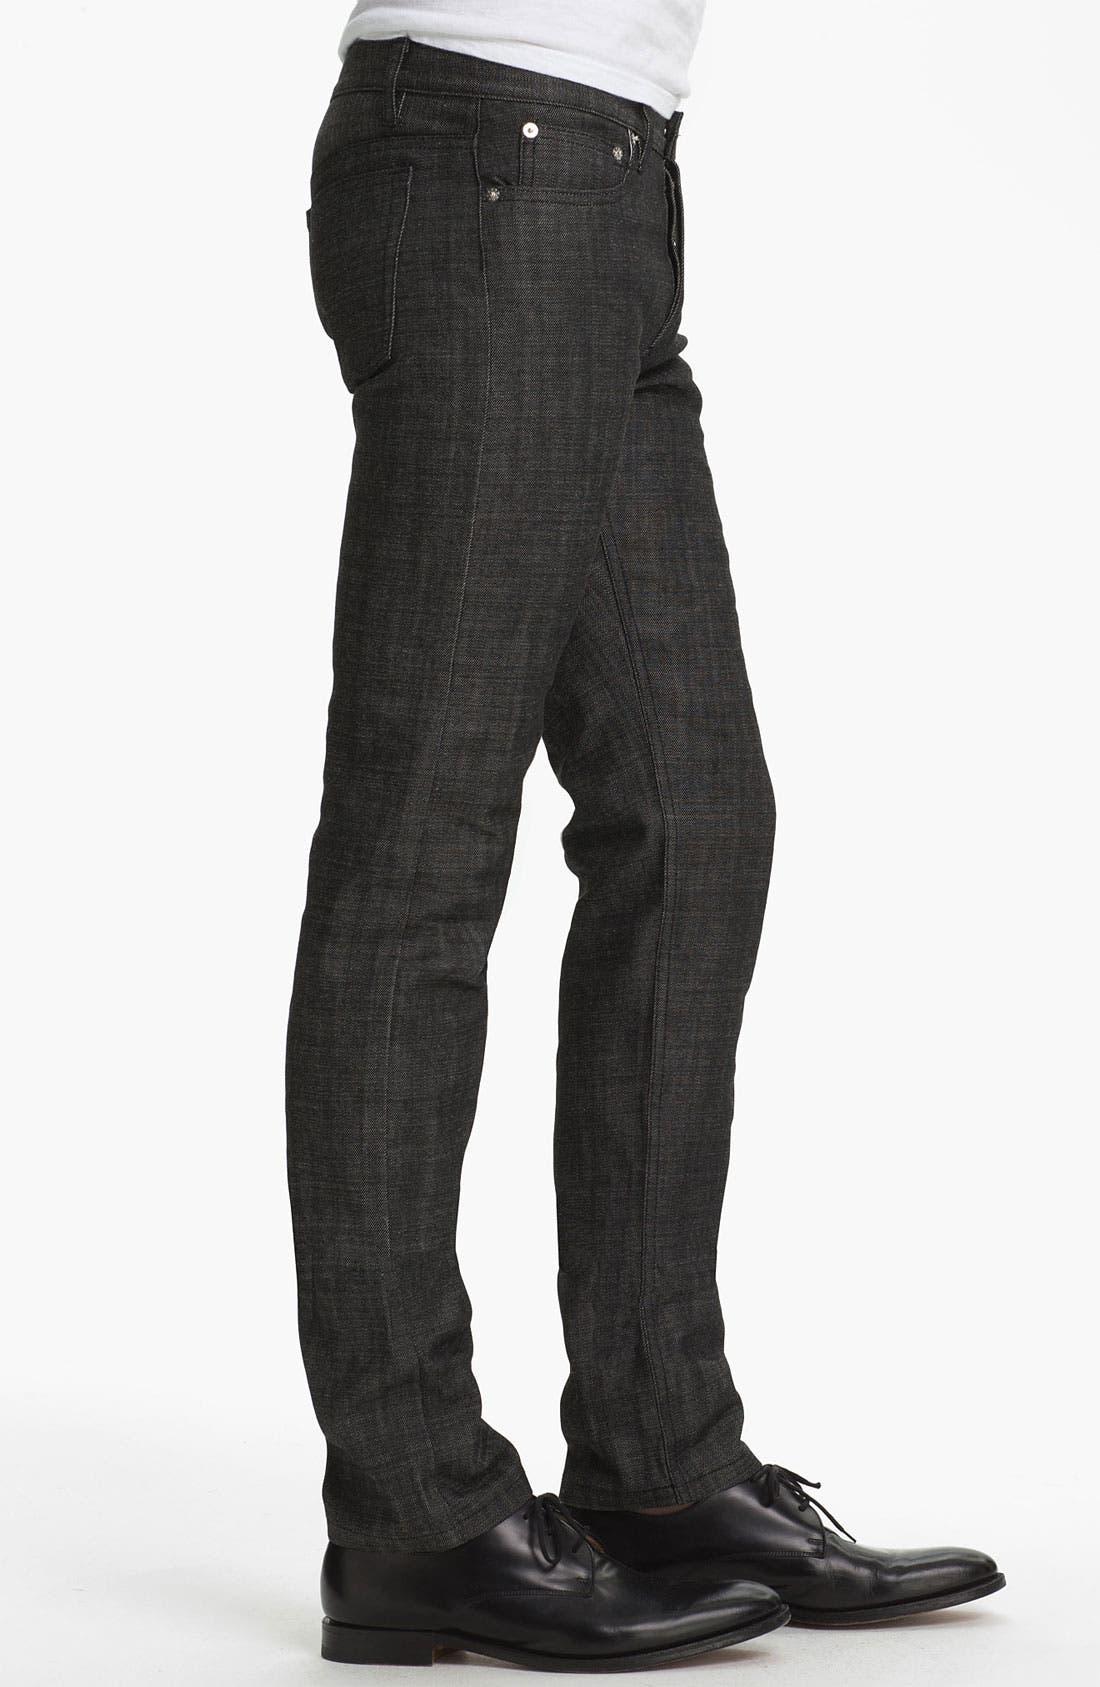 Alternate Image 3  - A.P.C. 'Petit Standard' Slim Leg Jeans (Black) (Online Only)